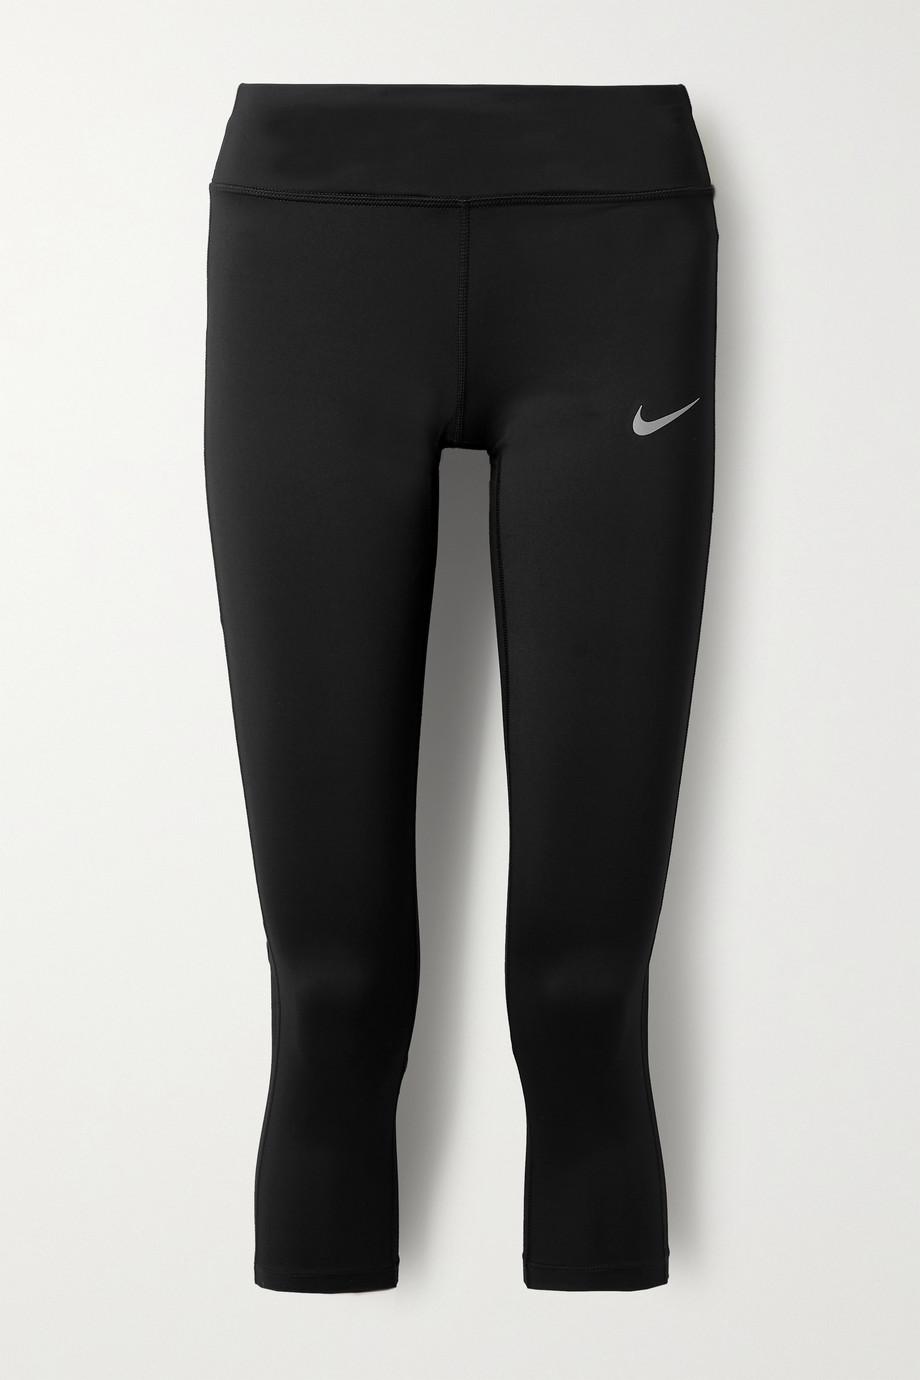 Nike Racer cropped mesh-trimmed Dri-FIT leggings